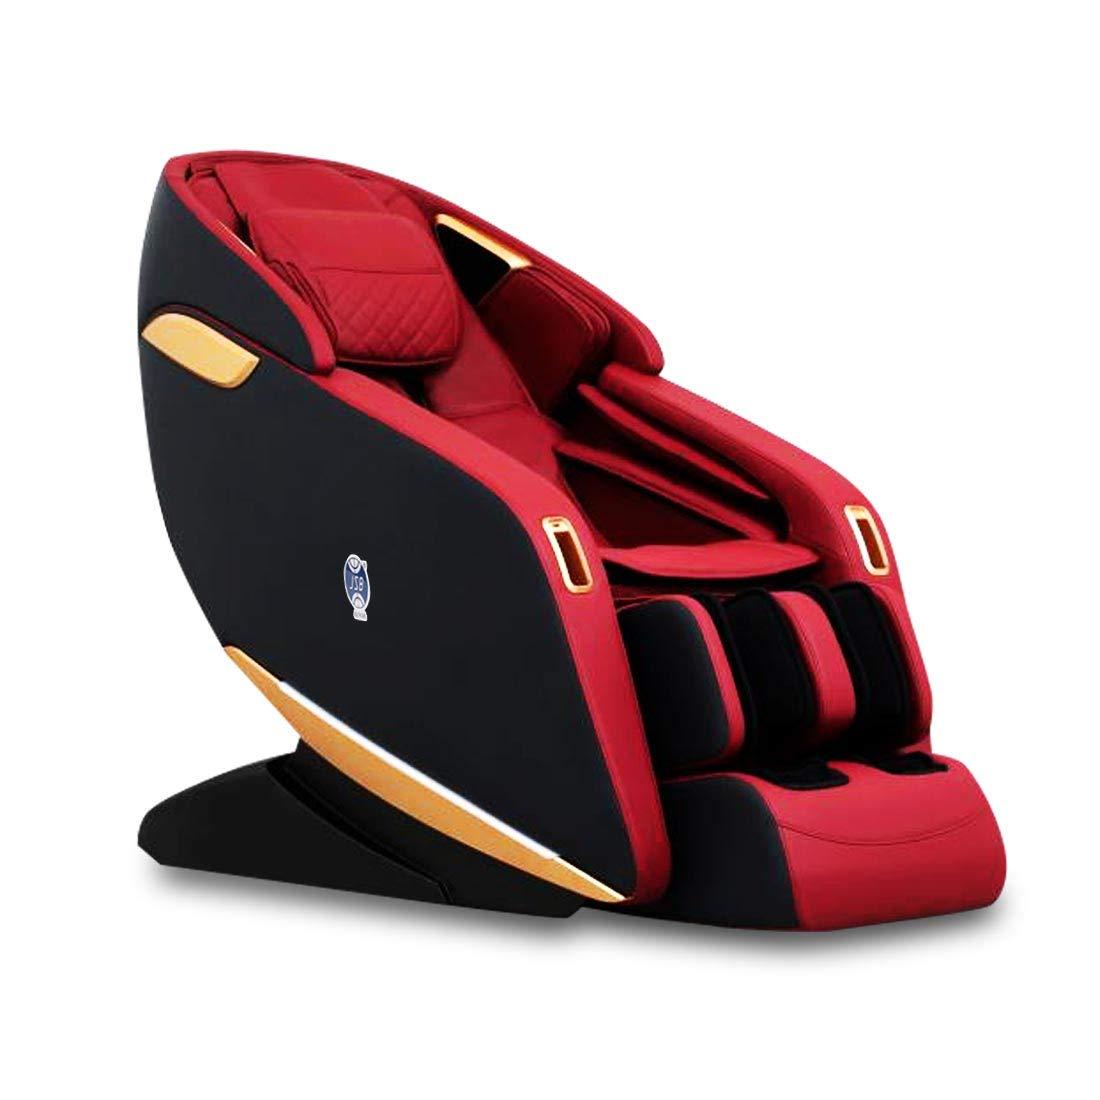 JSB 3D Massage Chair Zero Gravity with Bluetooth Music